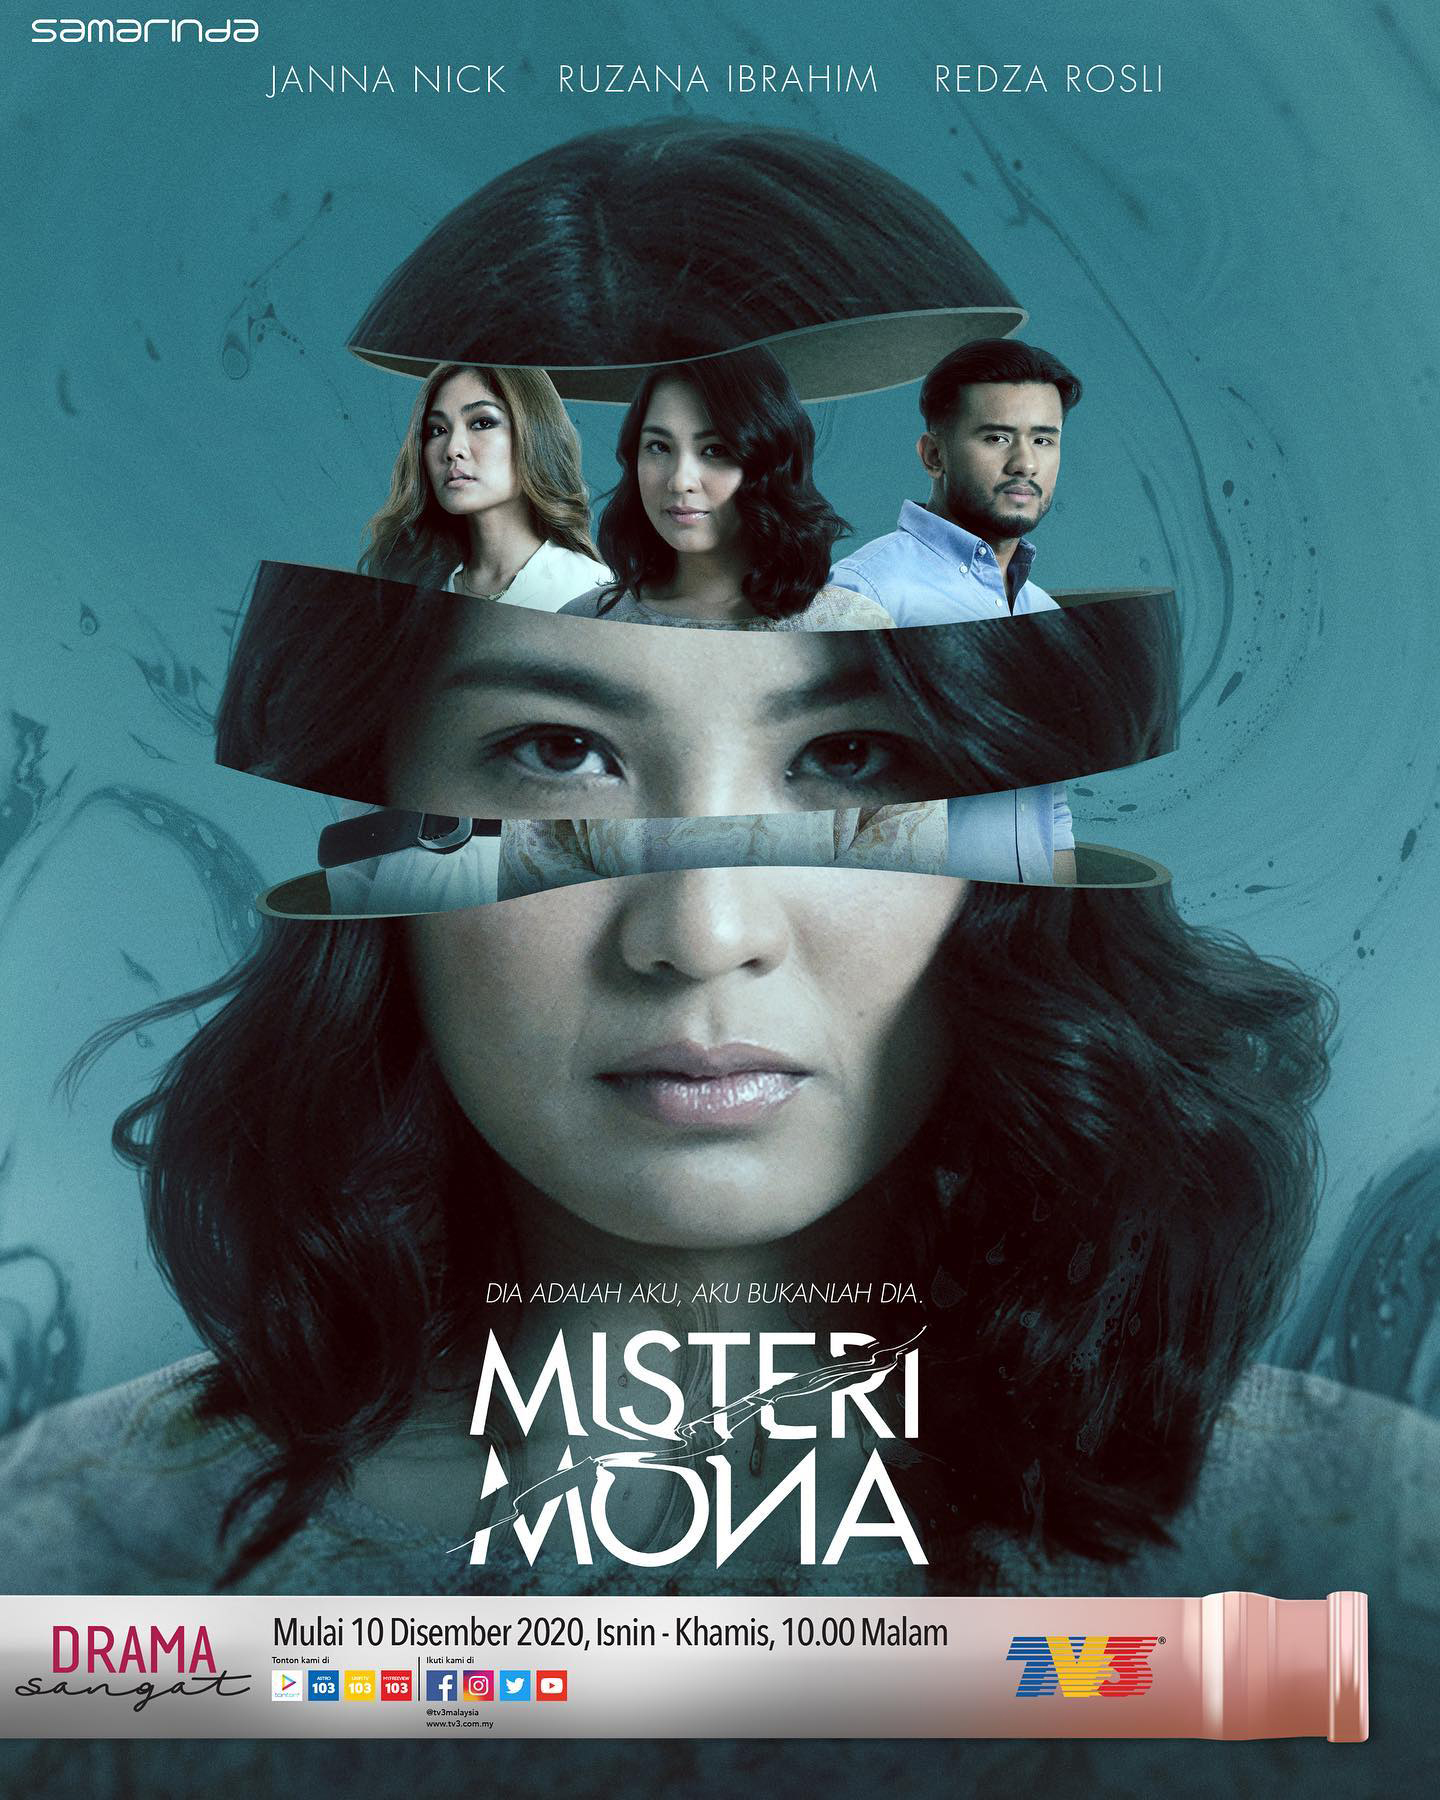 Drama Misteri Mona Episod 1-8 (Akhir) Lakonan Janna Nick dan Redza Rosli